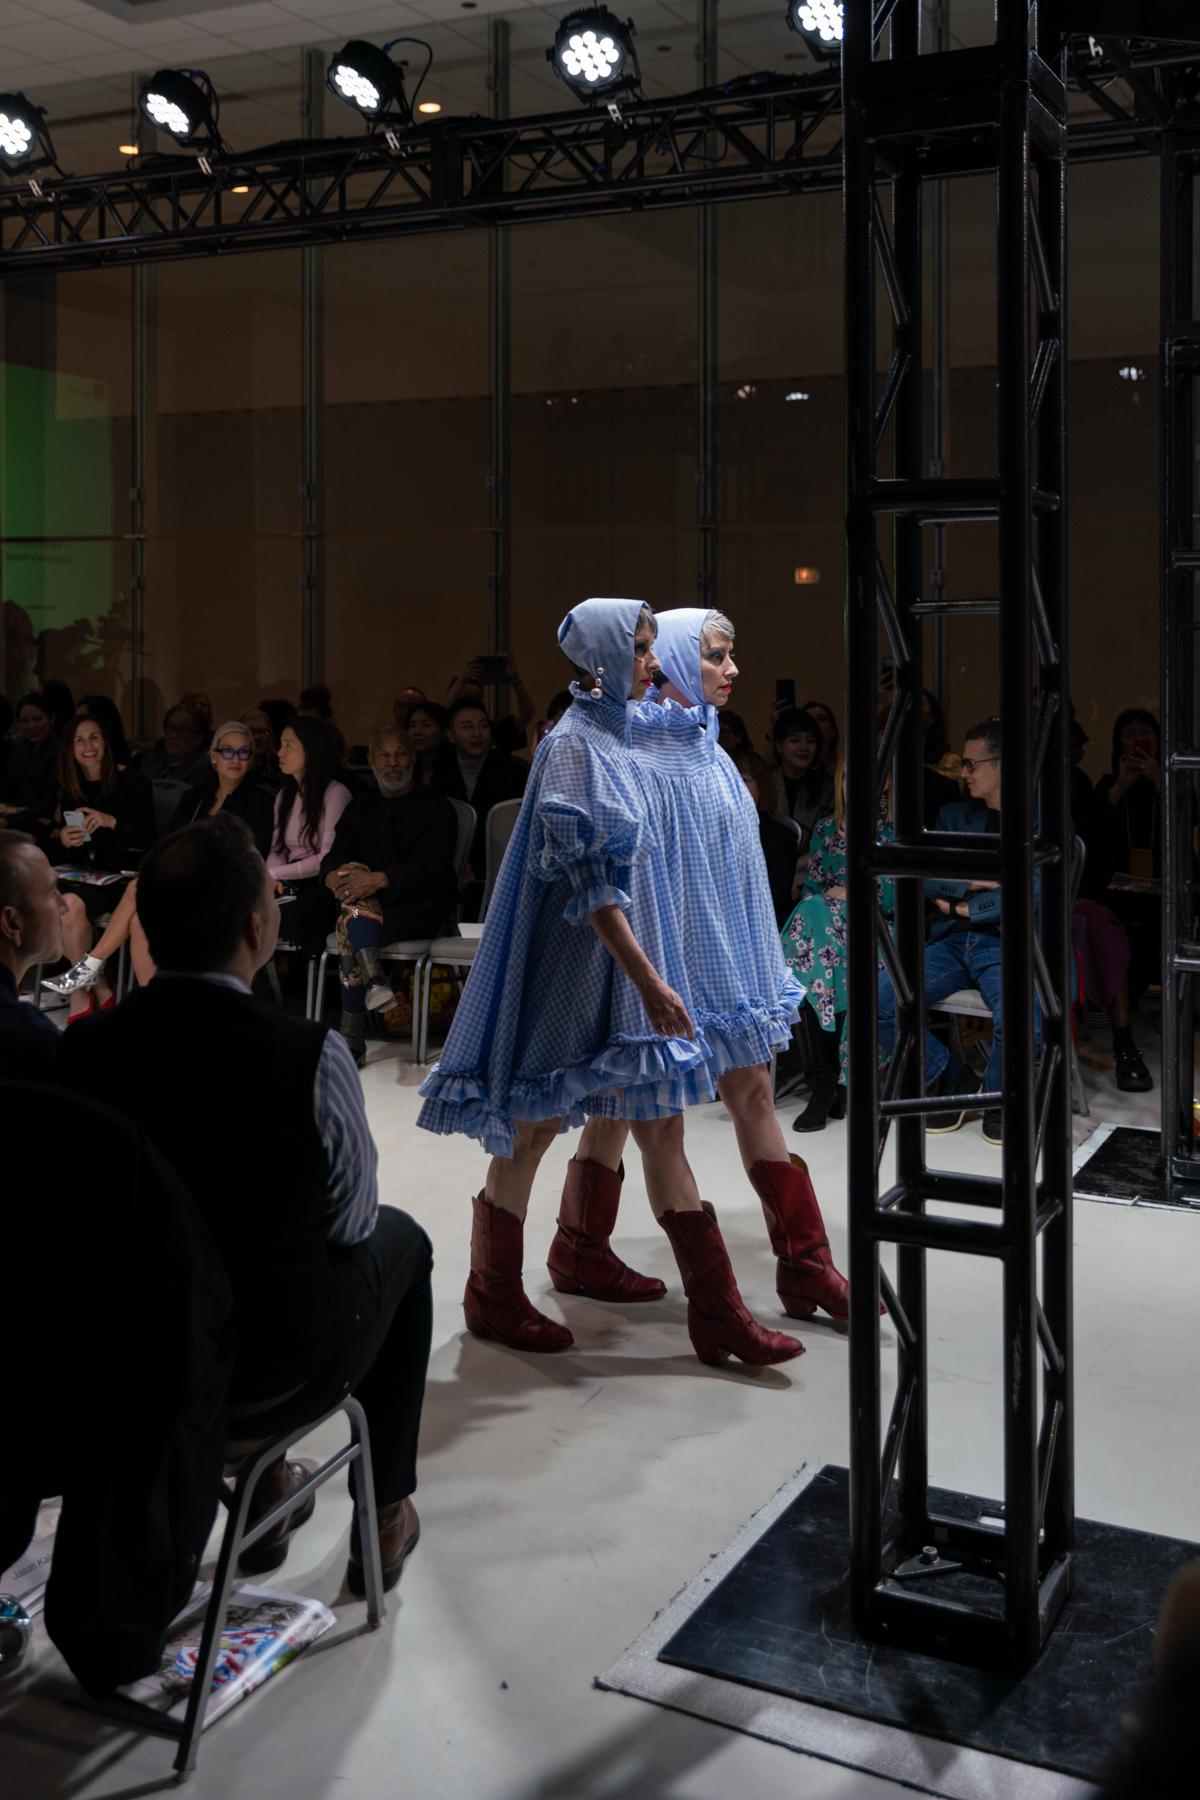 connor_fenwick_saic_fashion_event_08.jpg